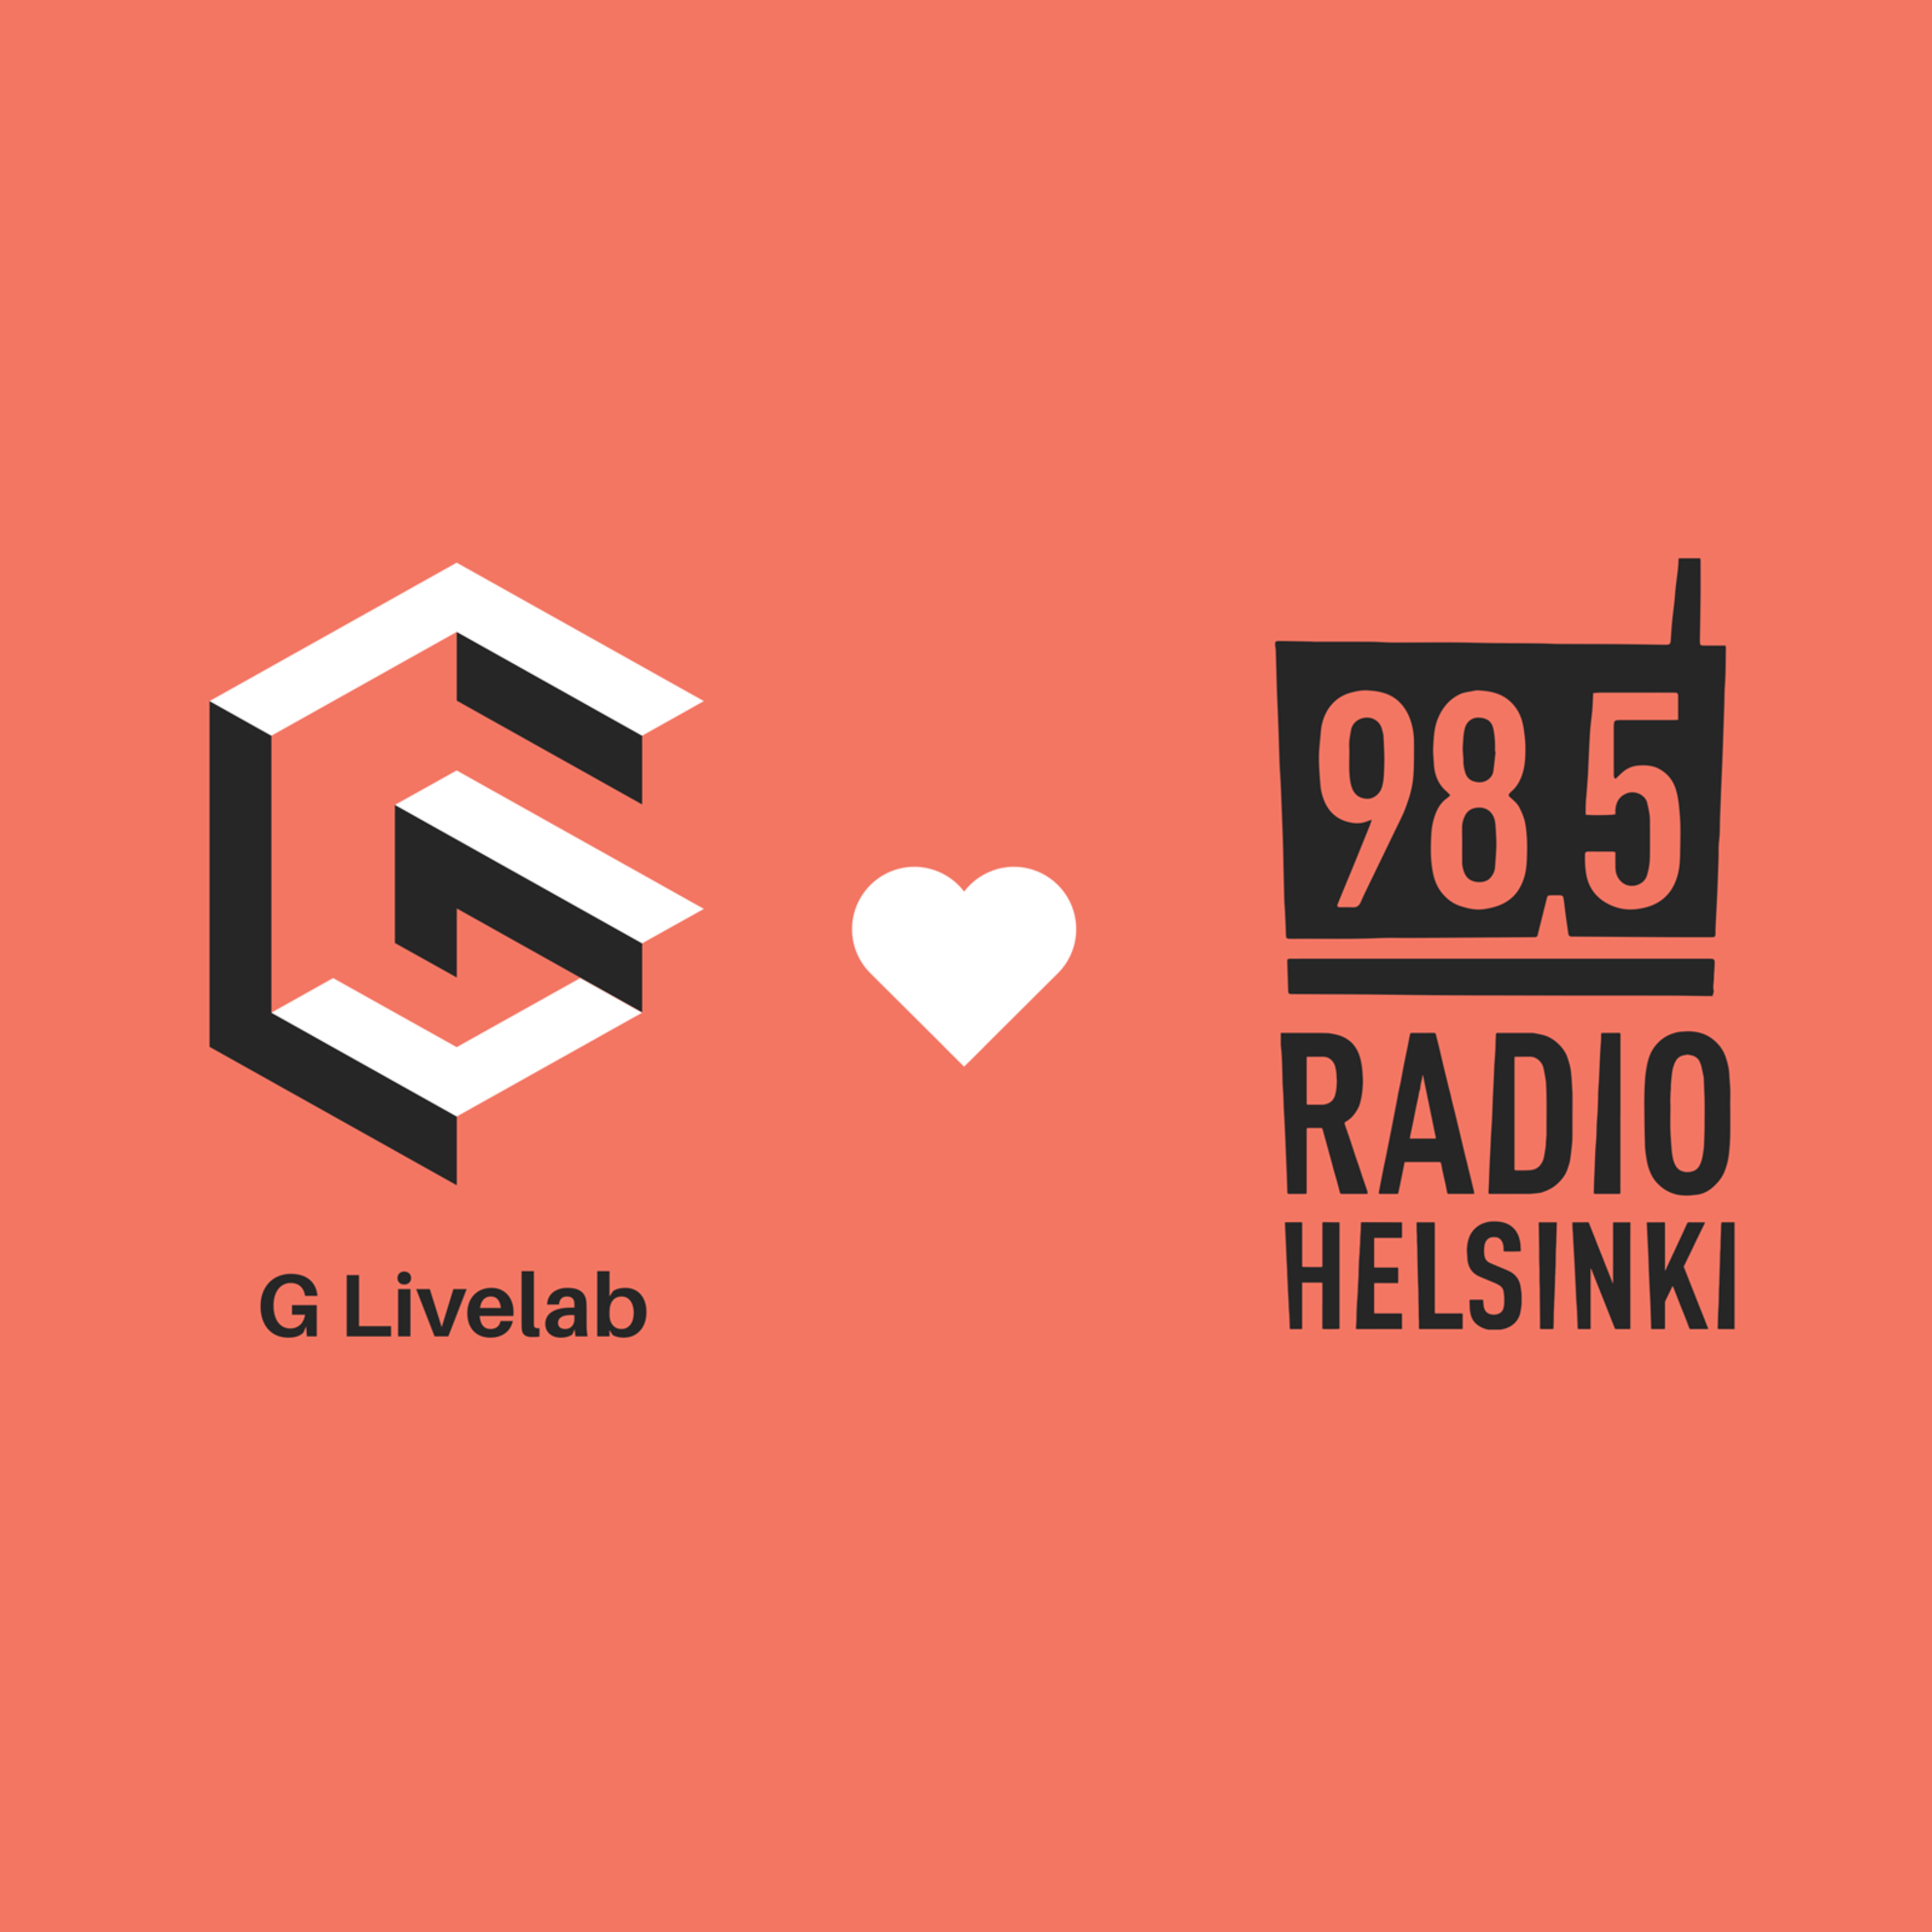 G Livelab suunnittelee laajentumista Tampereelle